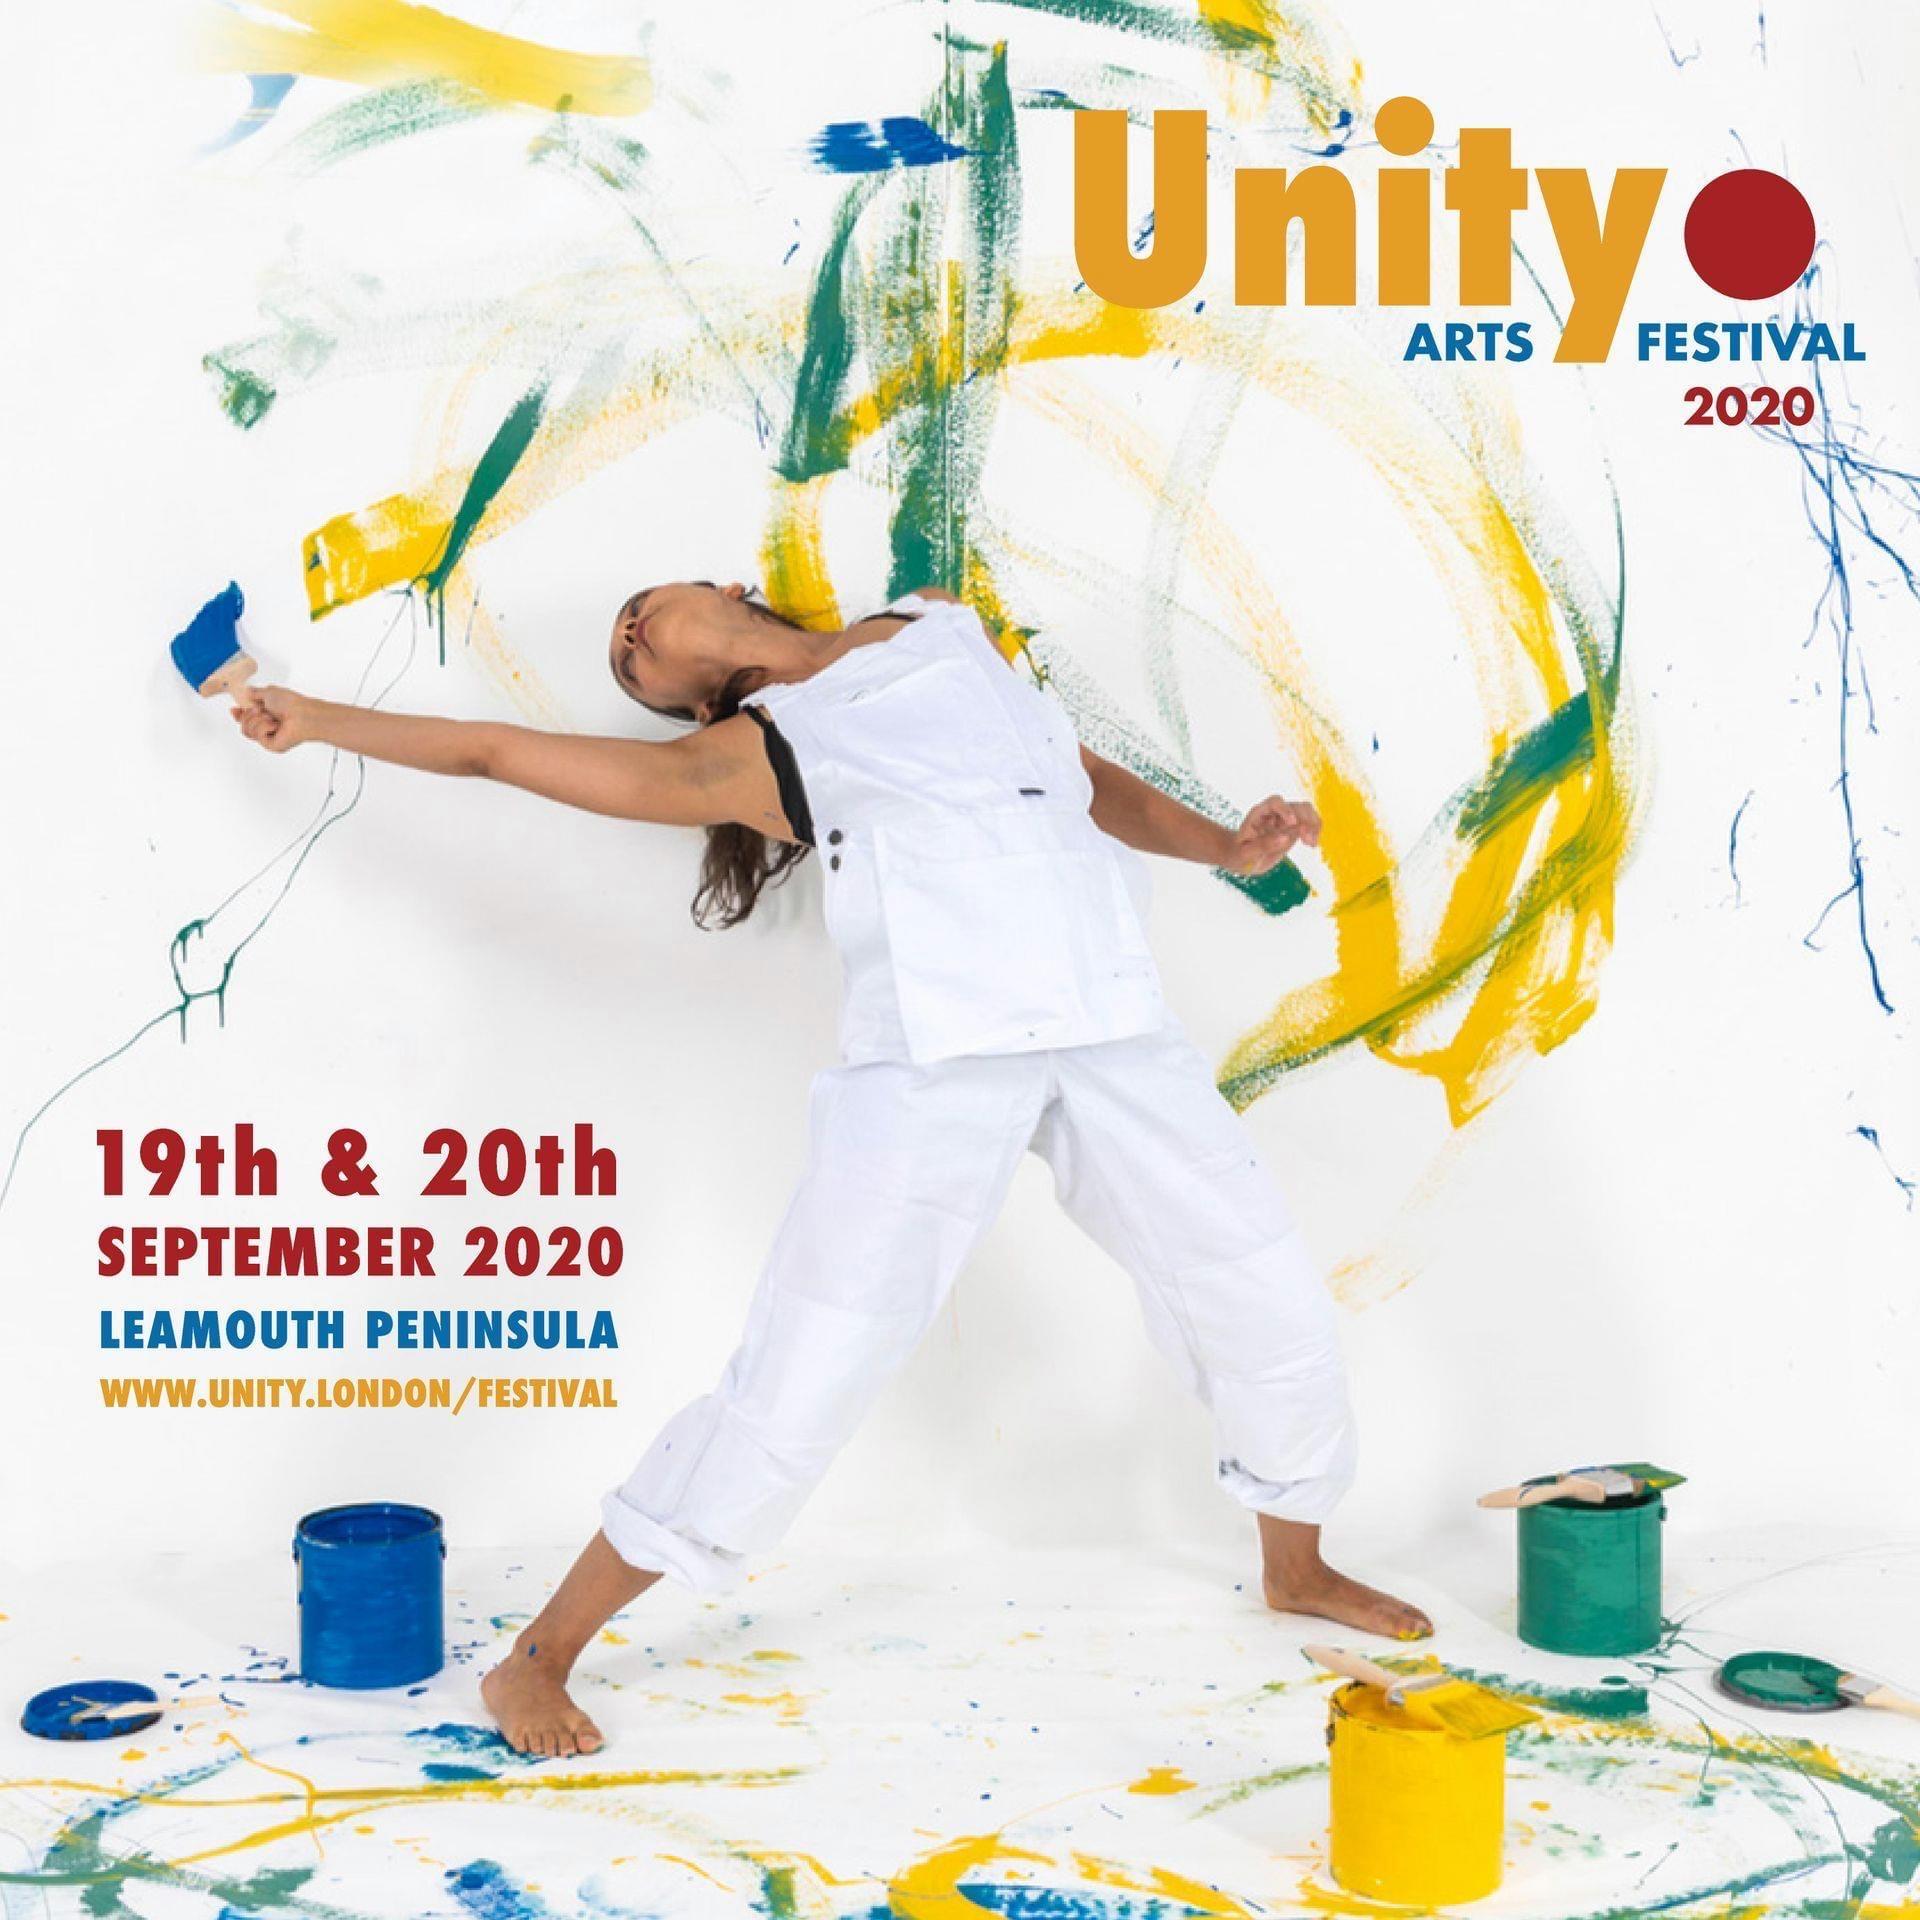 Unity Arts Festival